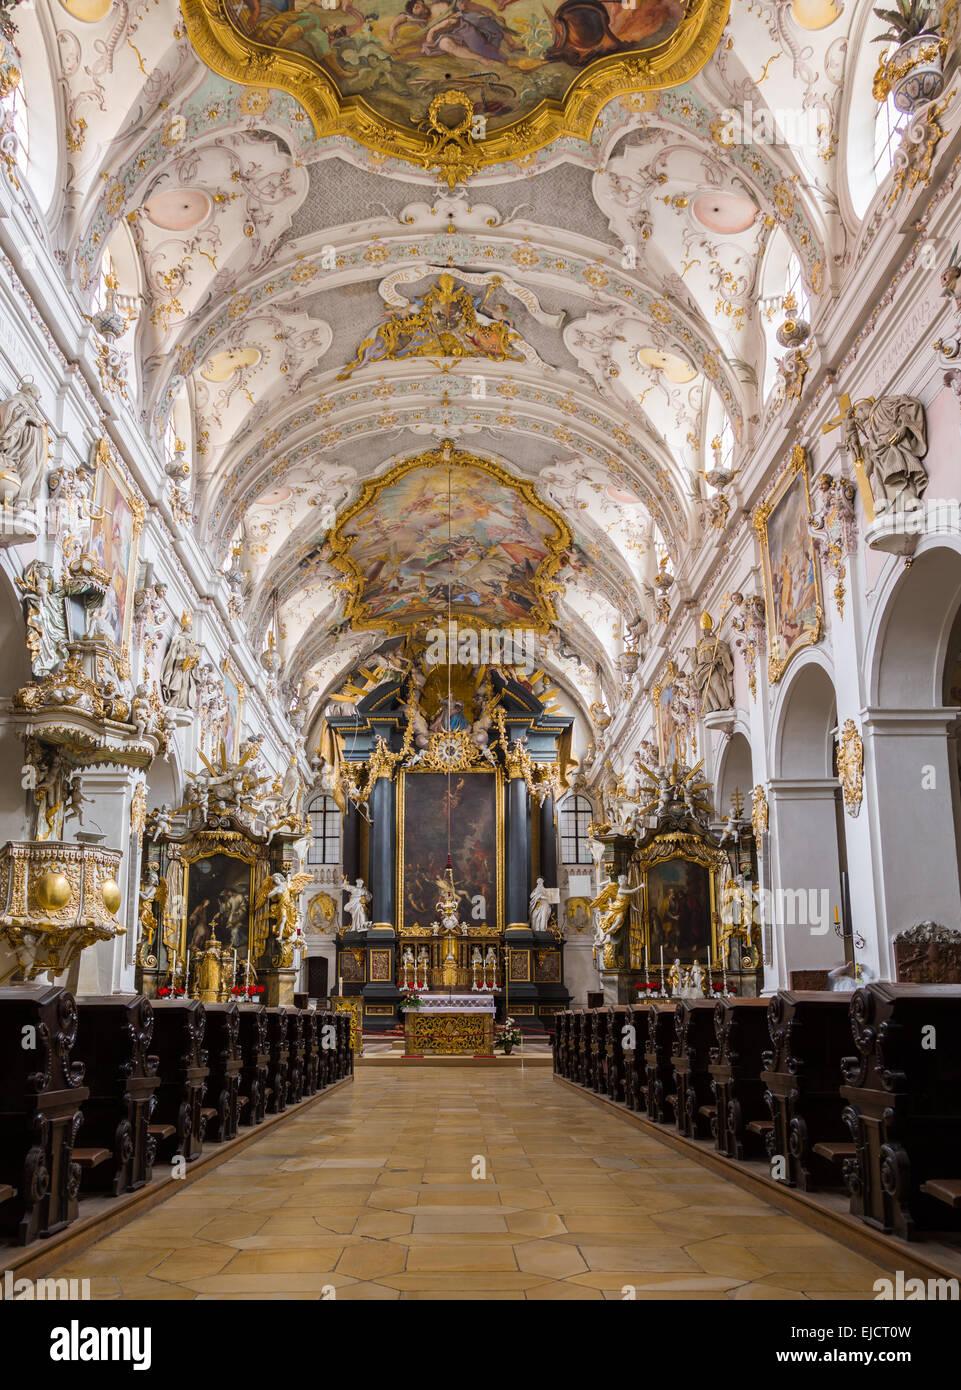 st emmeram church regensburg germany stock photo 80187545 alamy. Black Bedroom Furniture Sets. Home Design Ideas